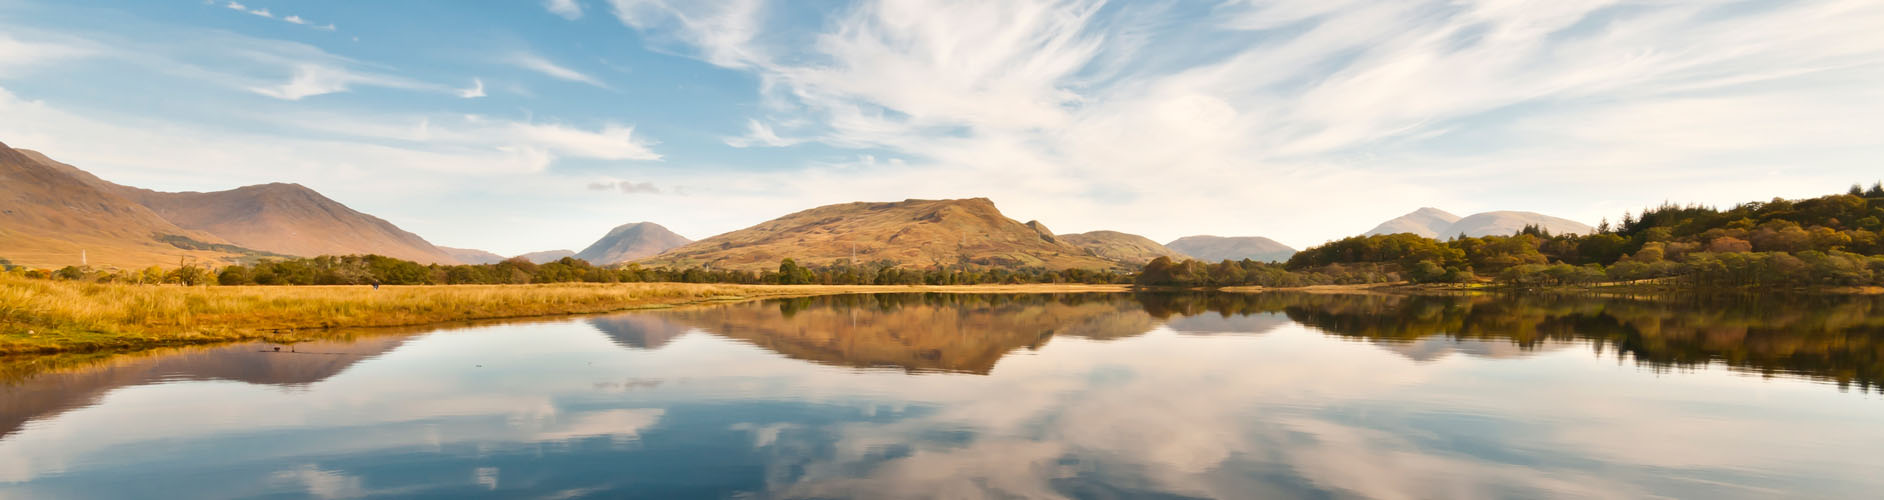 Cruising in Scotland - Argyll Cruising